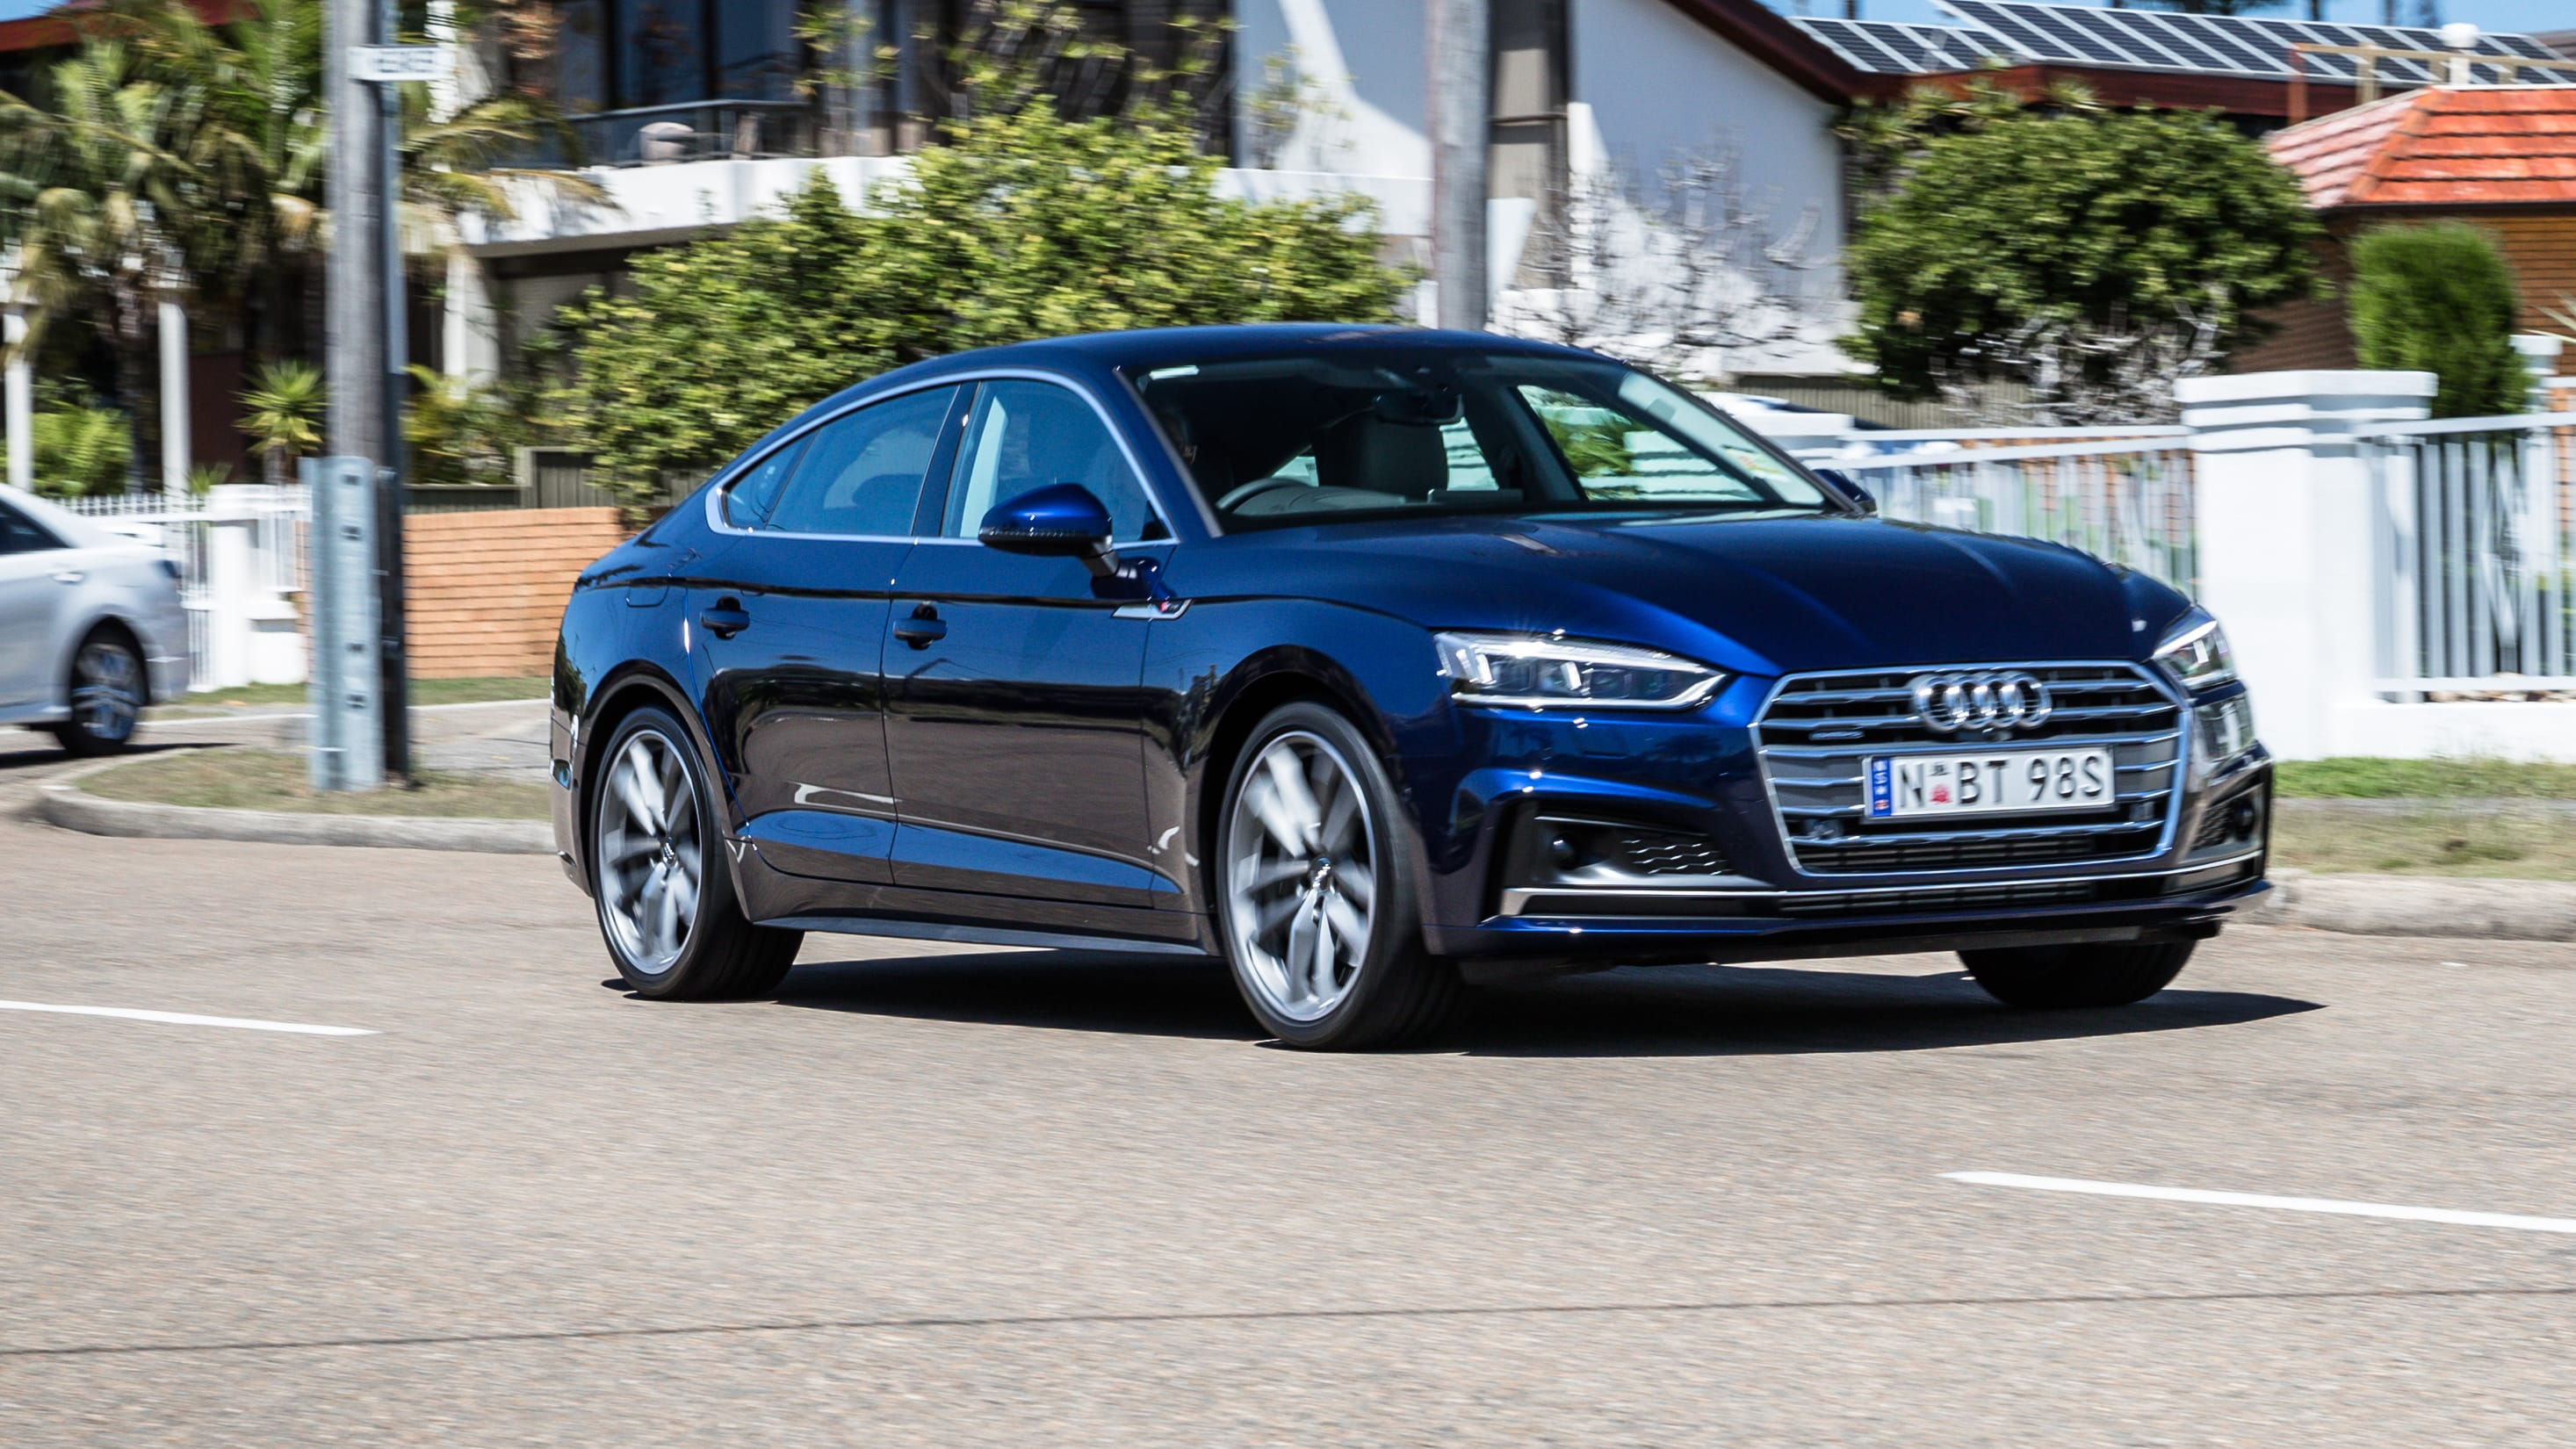 2020 Audi A5 Sportback Review 45 Tfsi Quattro Caradvice